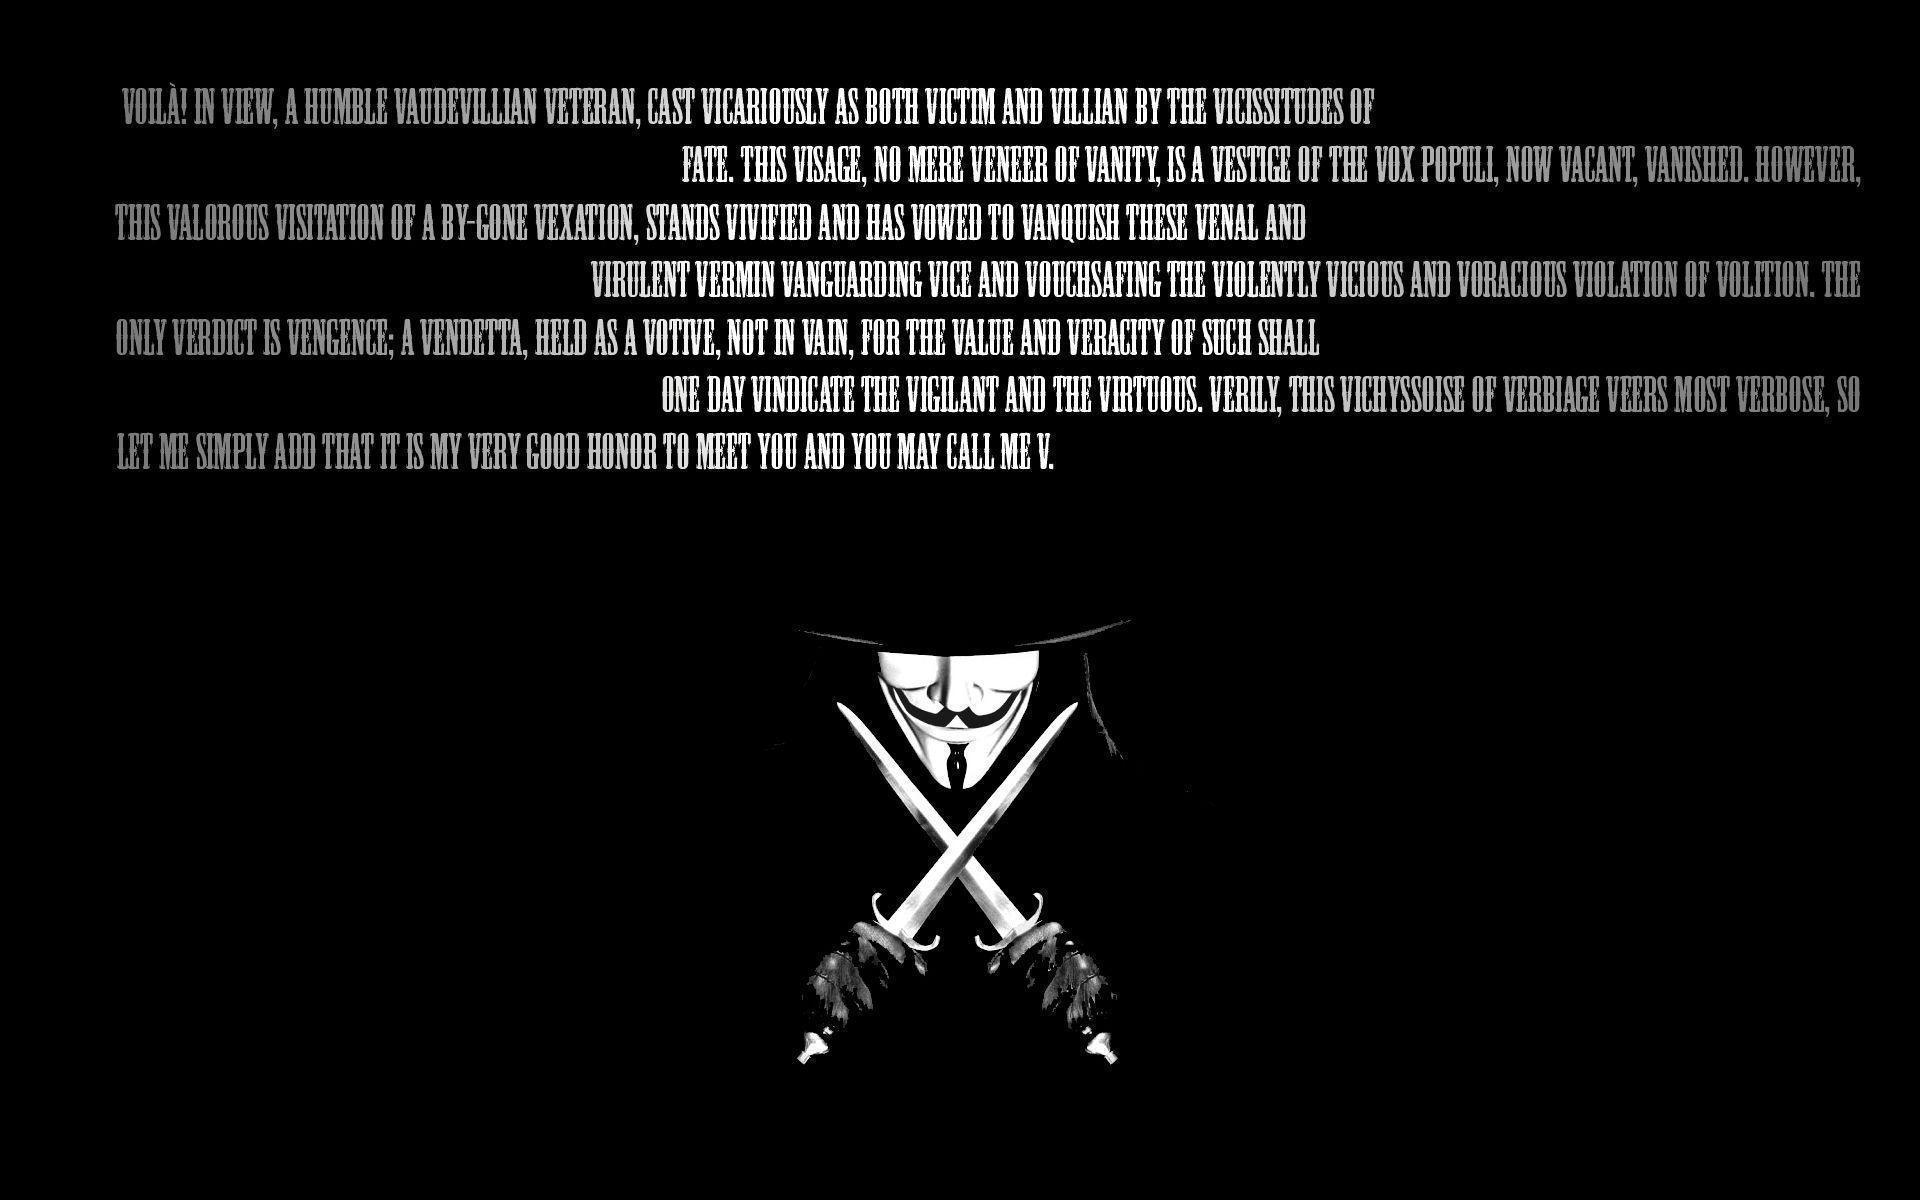 V For Vendetta Wallpaper Quotes V For Vendetta Wallpapers Wallpaper Cave